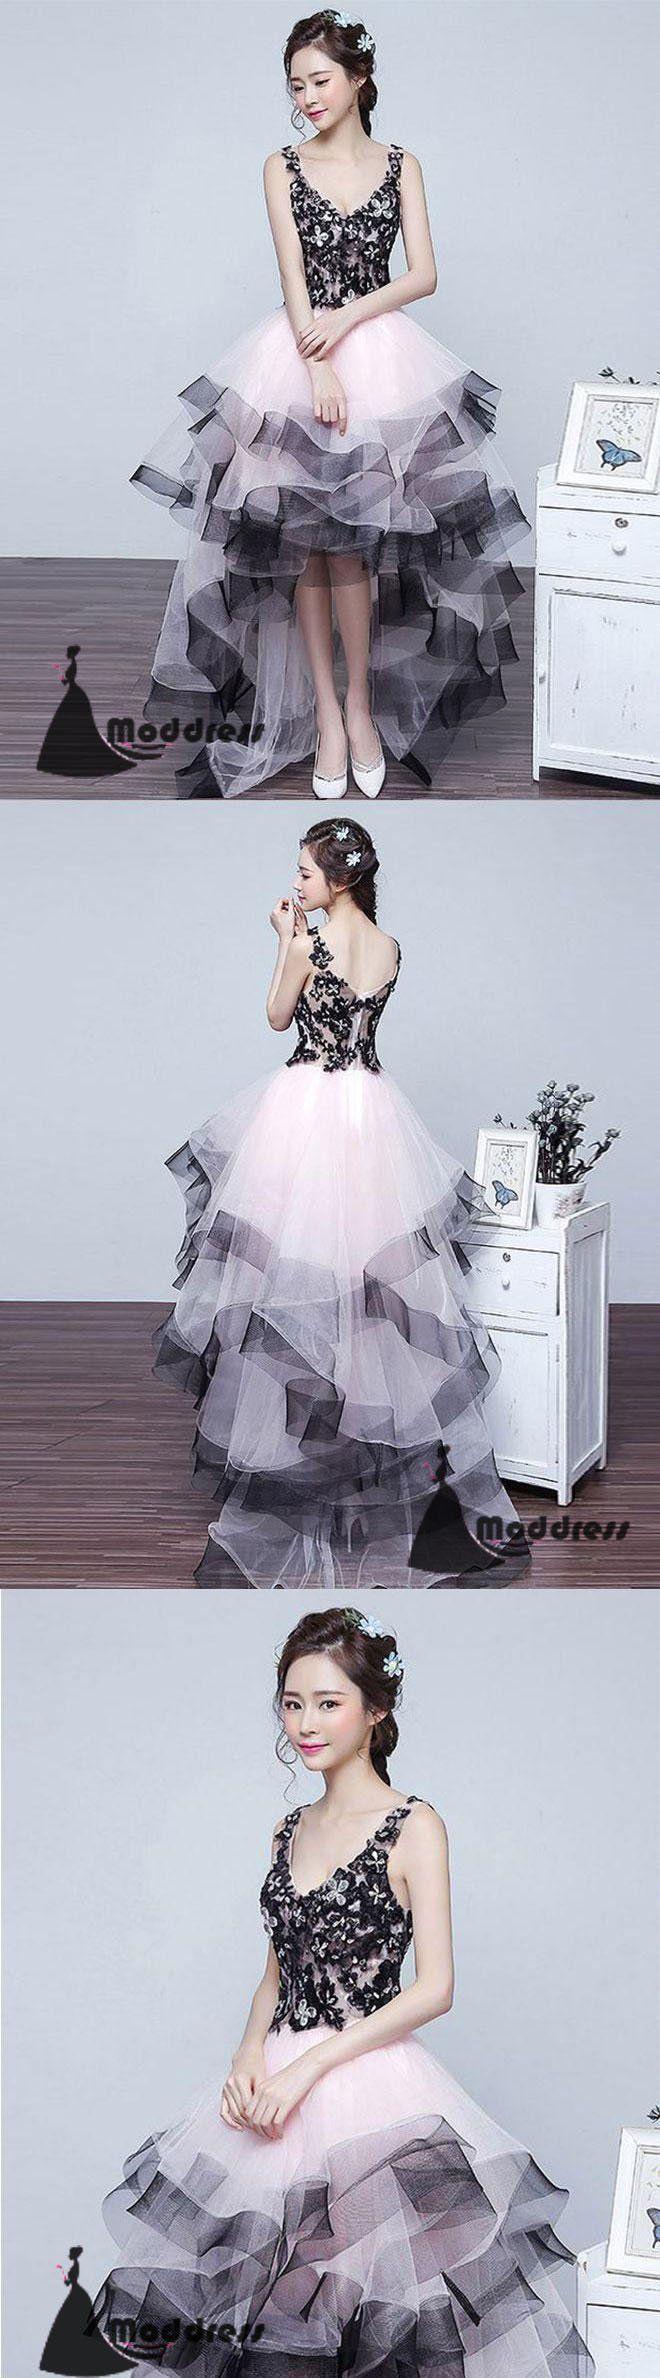 V-Neck Prom Dress High-Low Lace Evening Dress Applique Formal Dress,HS483 #fashion #shopping #promdresses #eveningdresses #prom #dresses